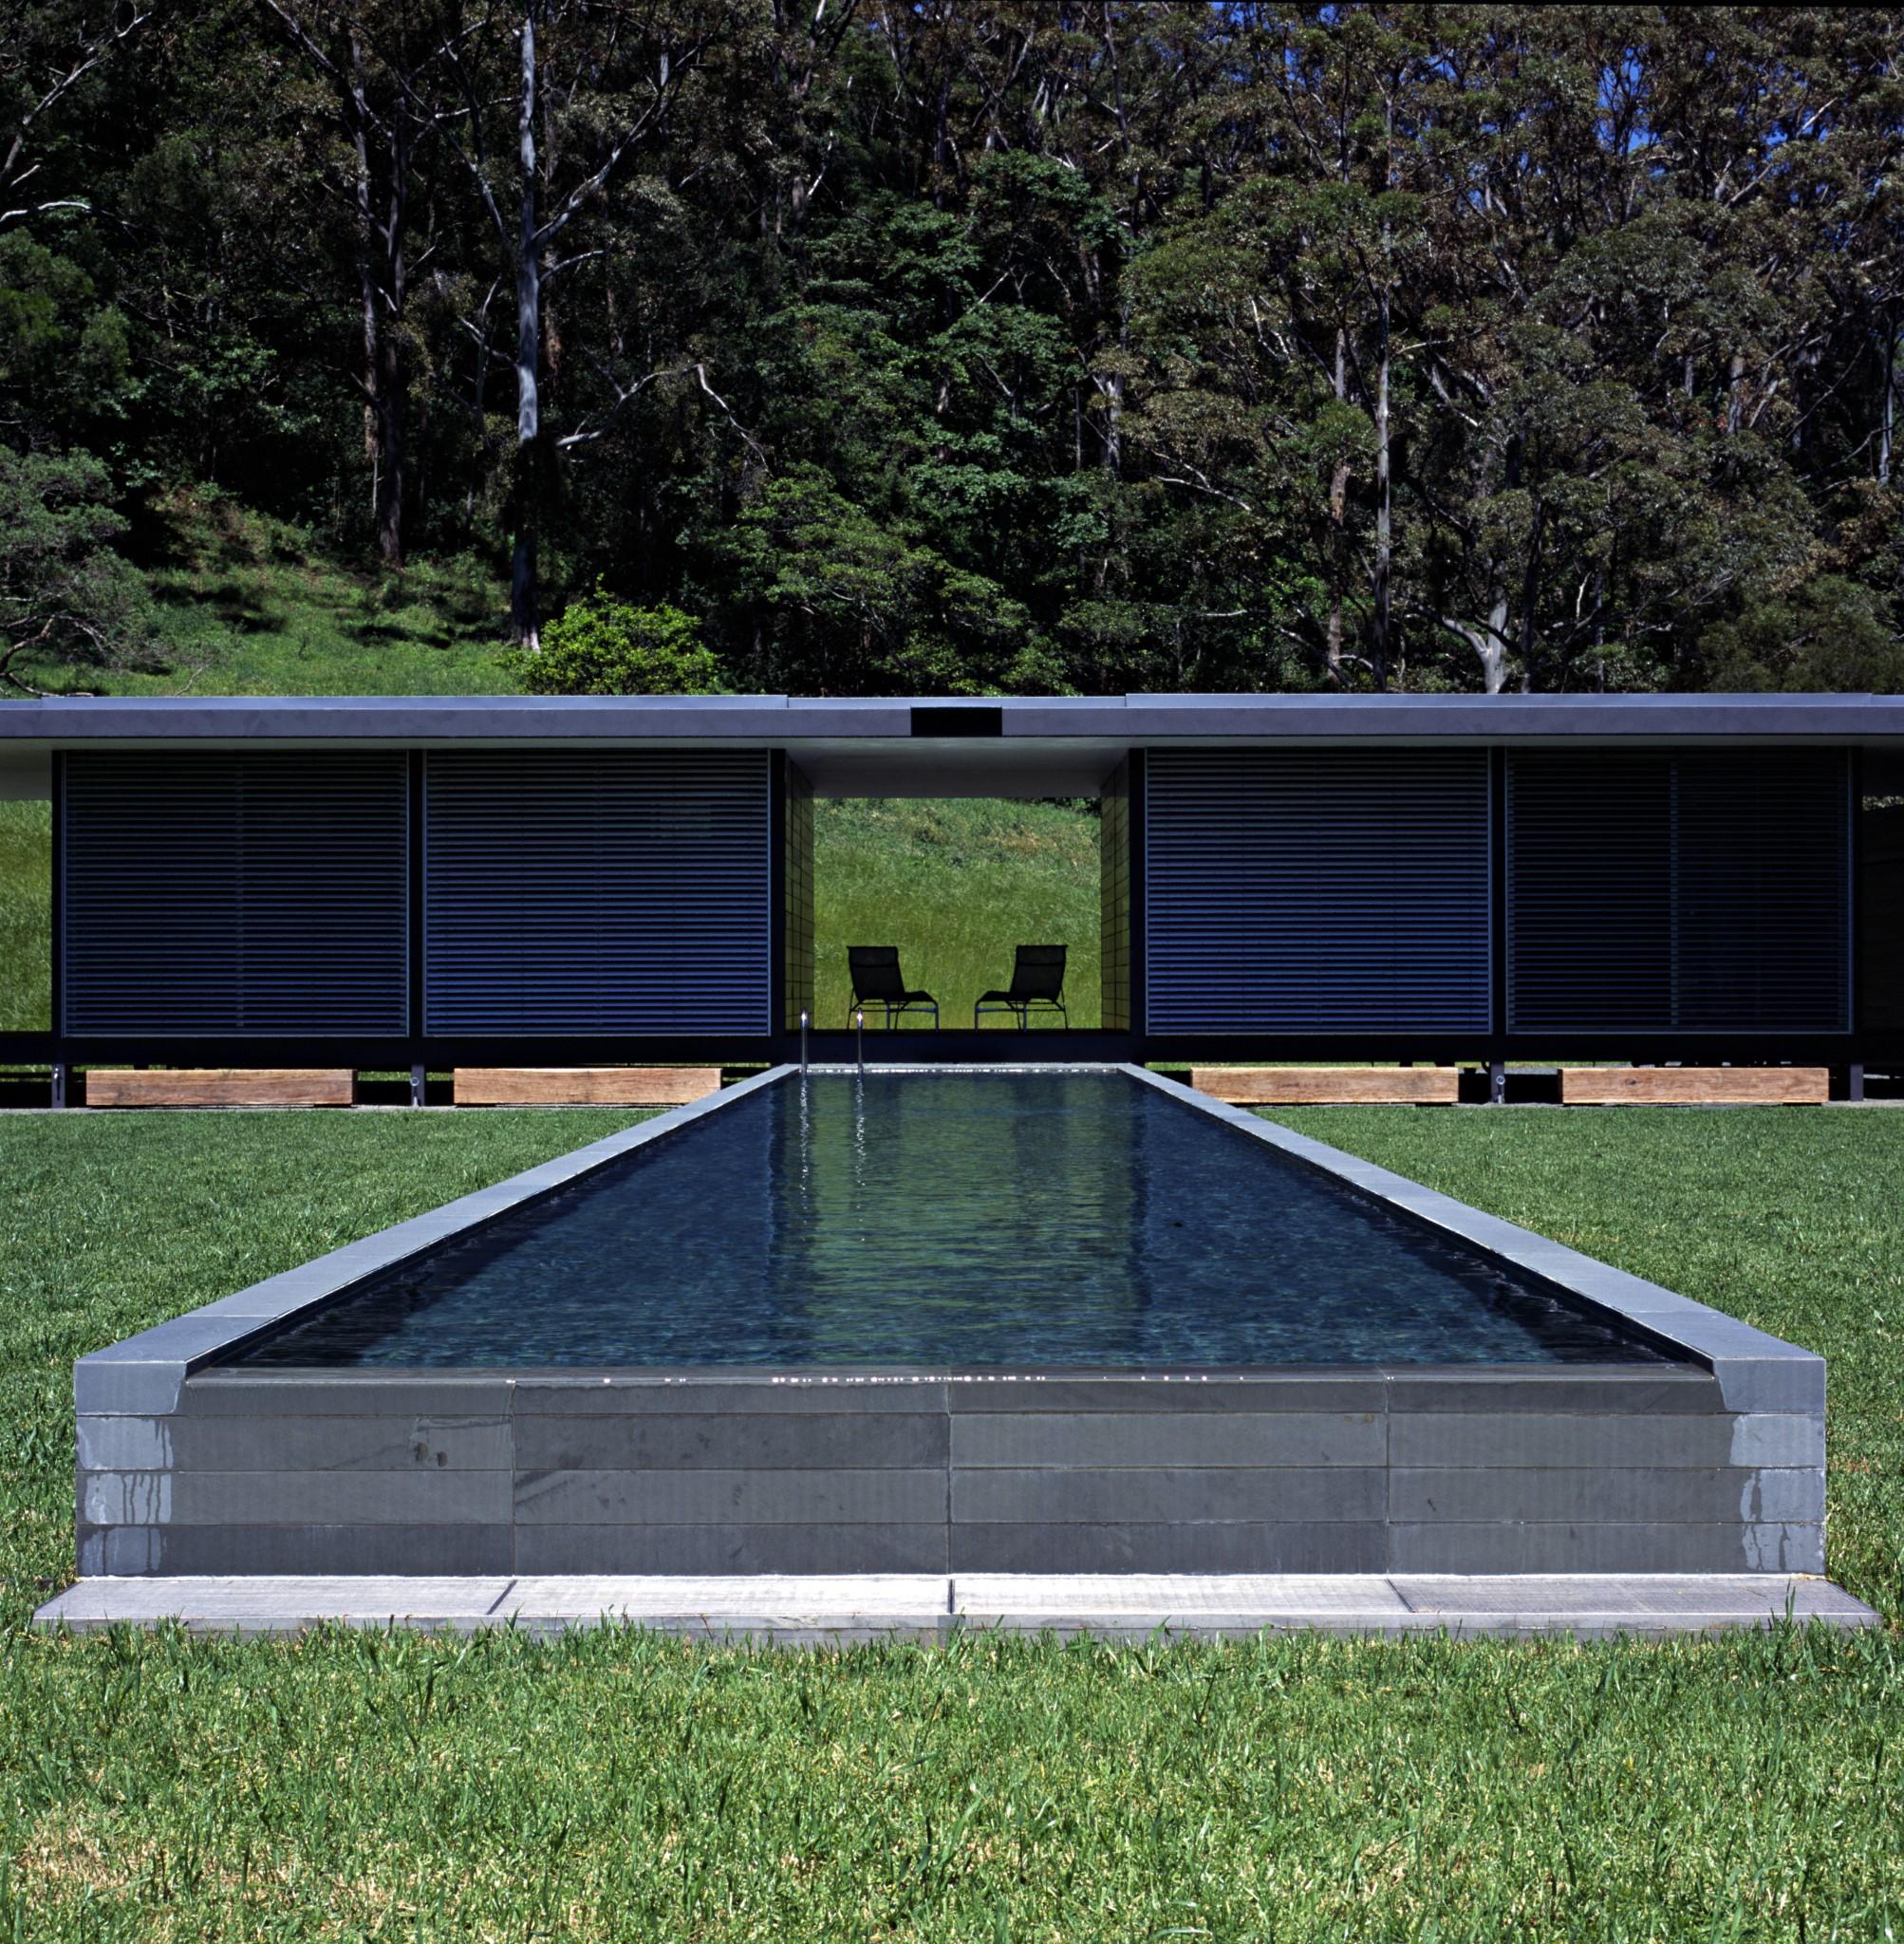 Luxury swimming pool lap design in gray tones